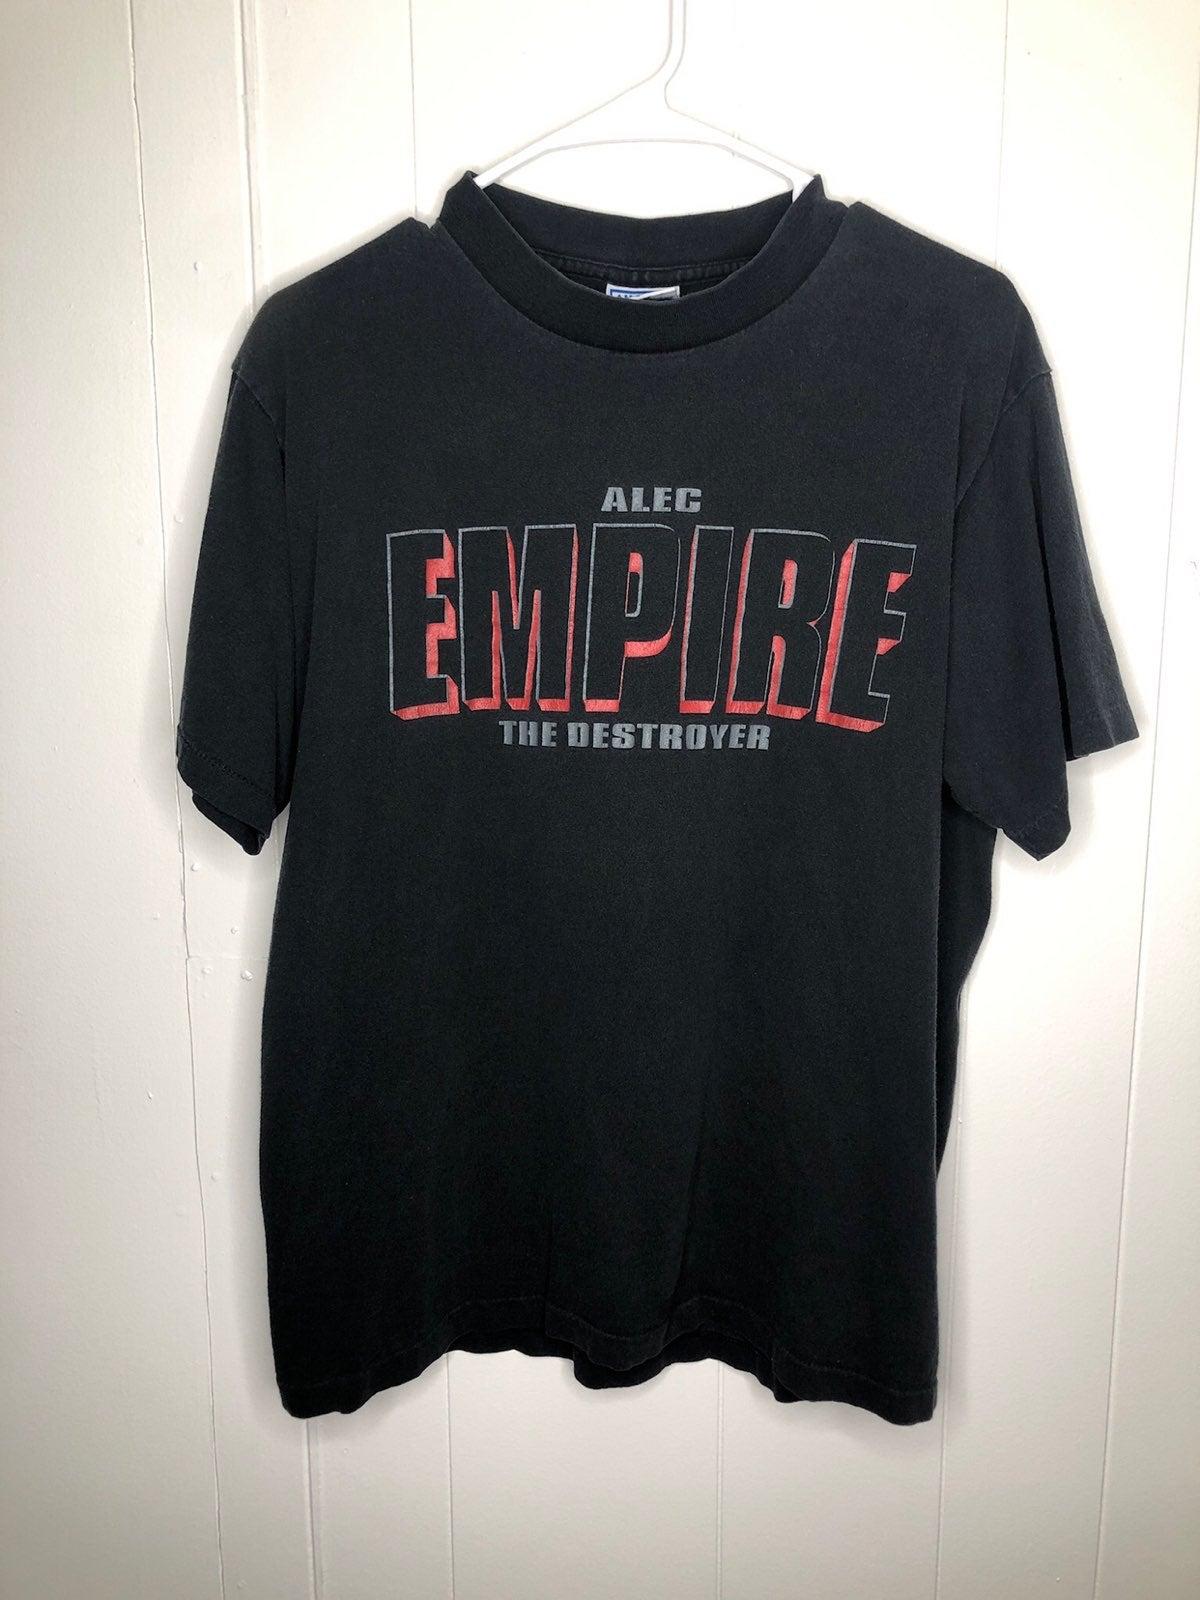 Vintage Alec Empire the destroyer Shirt